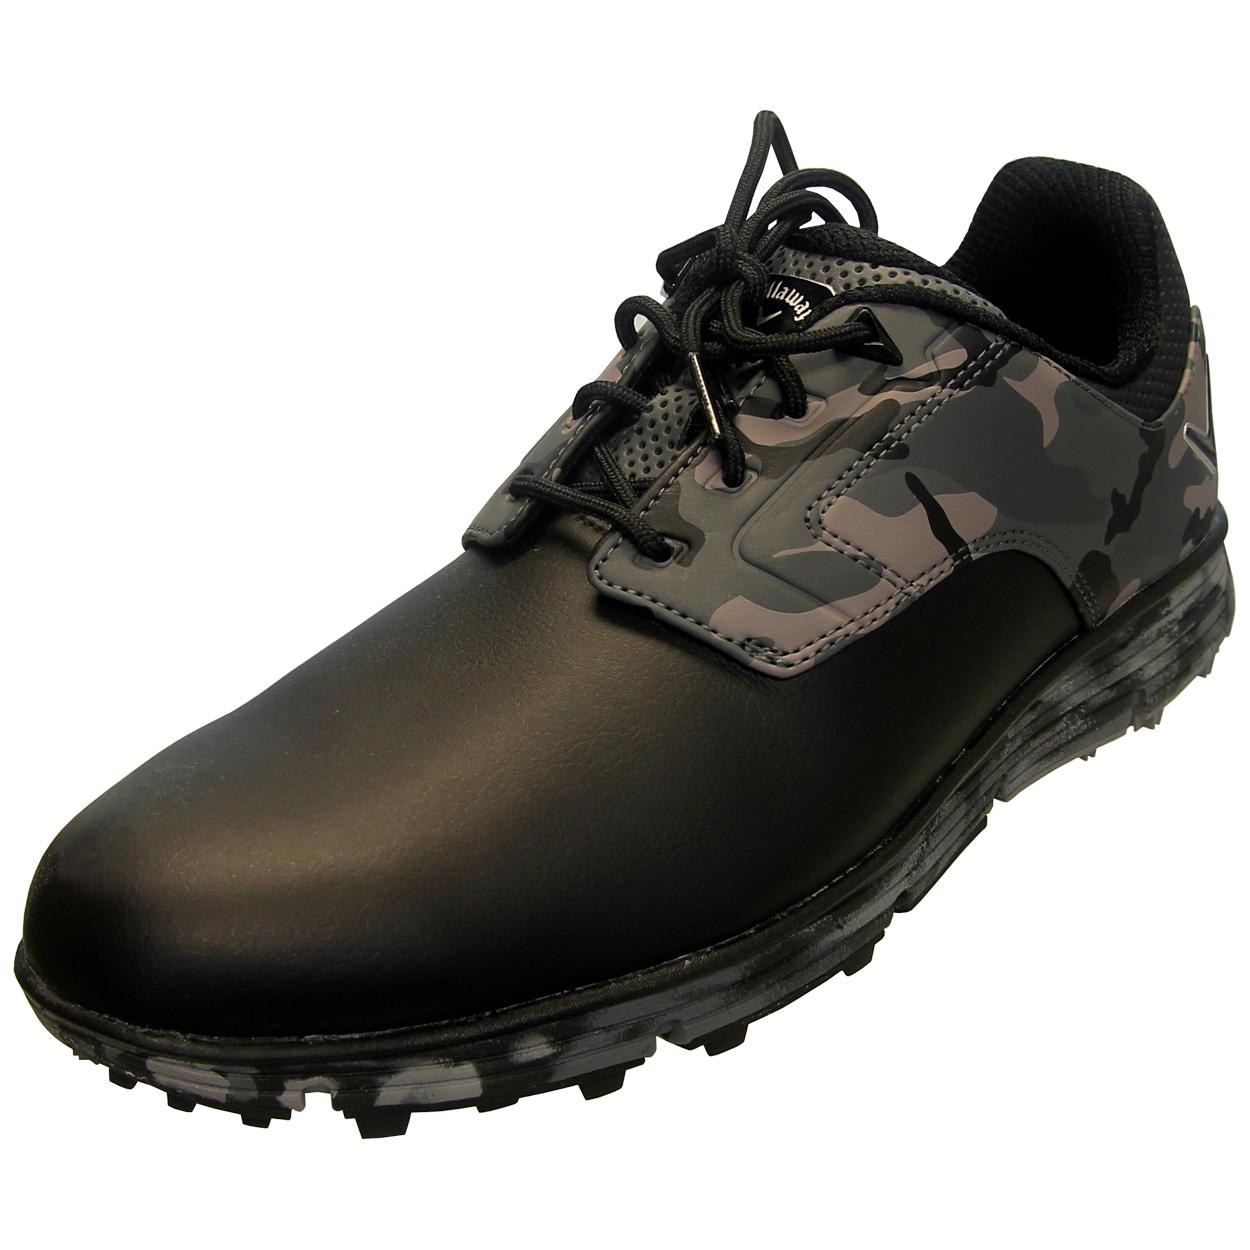 Callaway La Jolla (Sl) Spikeless Golf Shoe